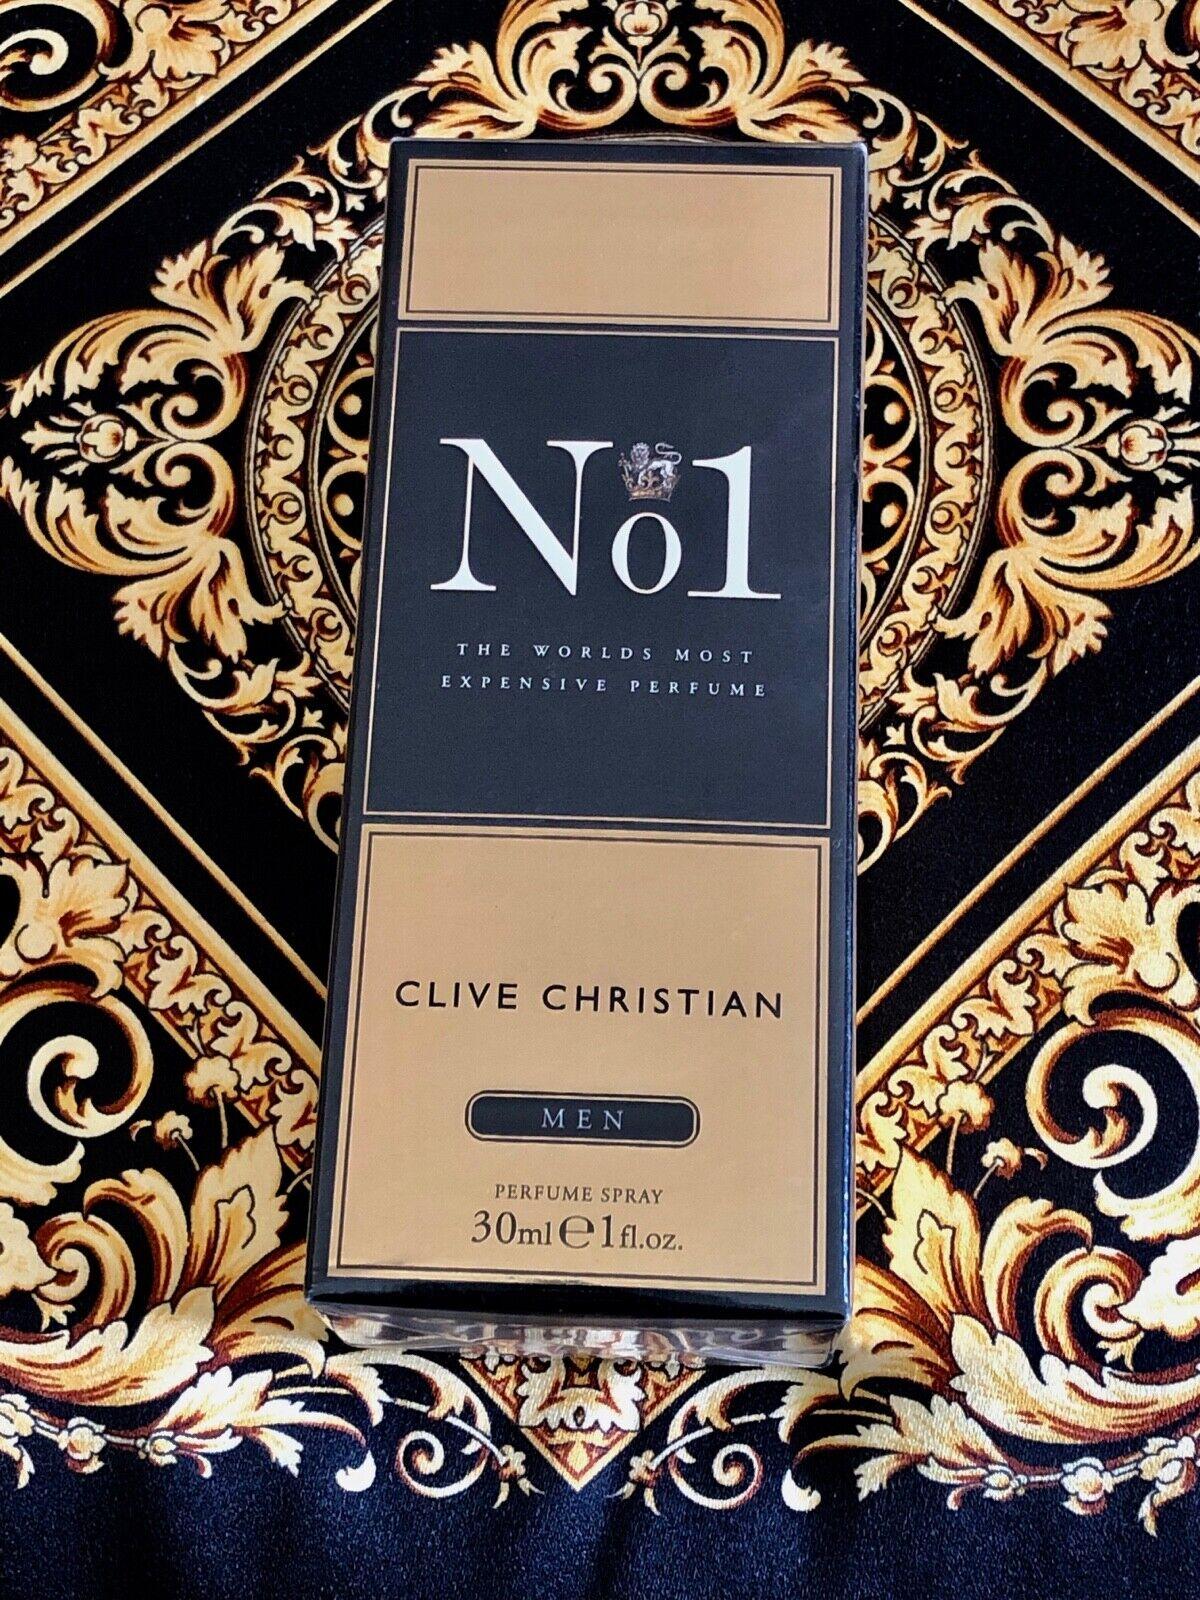 Genuine Clive Christian No. 1 Perfume for men 1 oz 30ml Bran